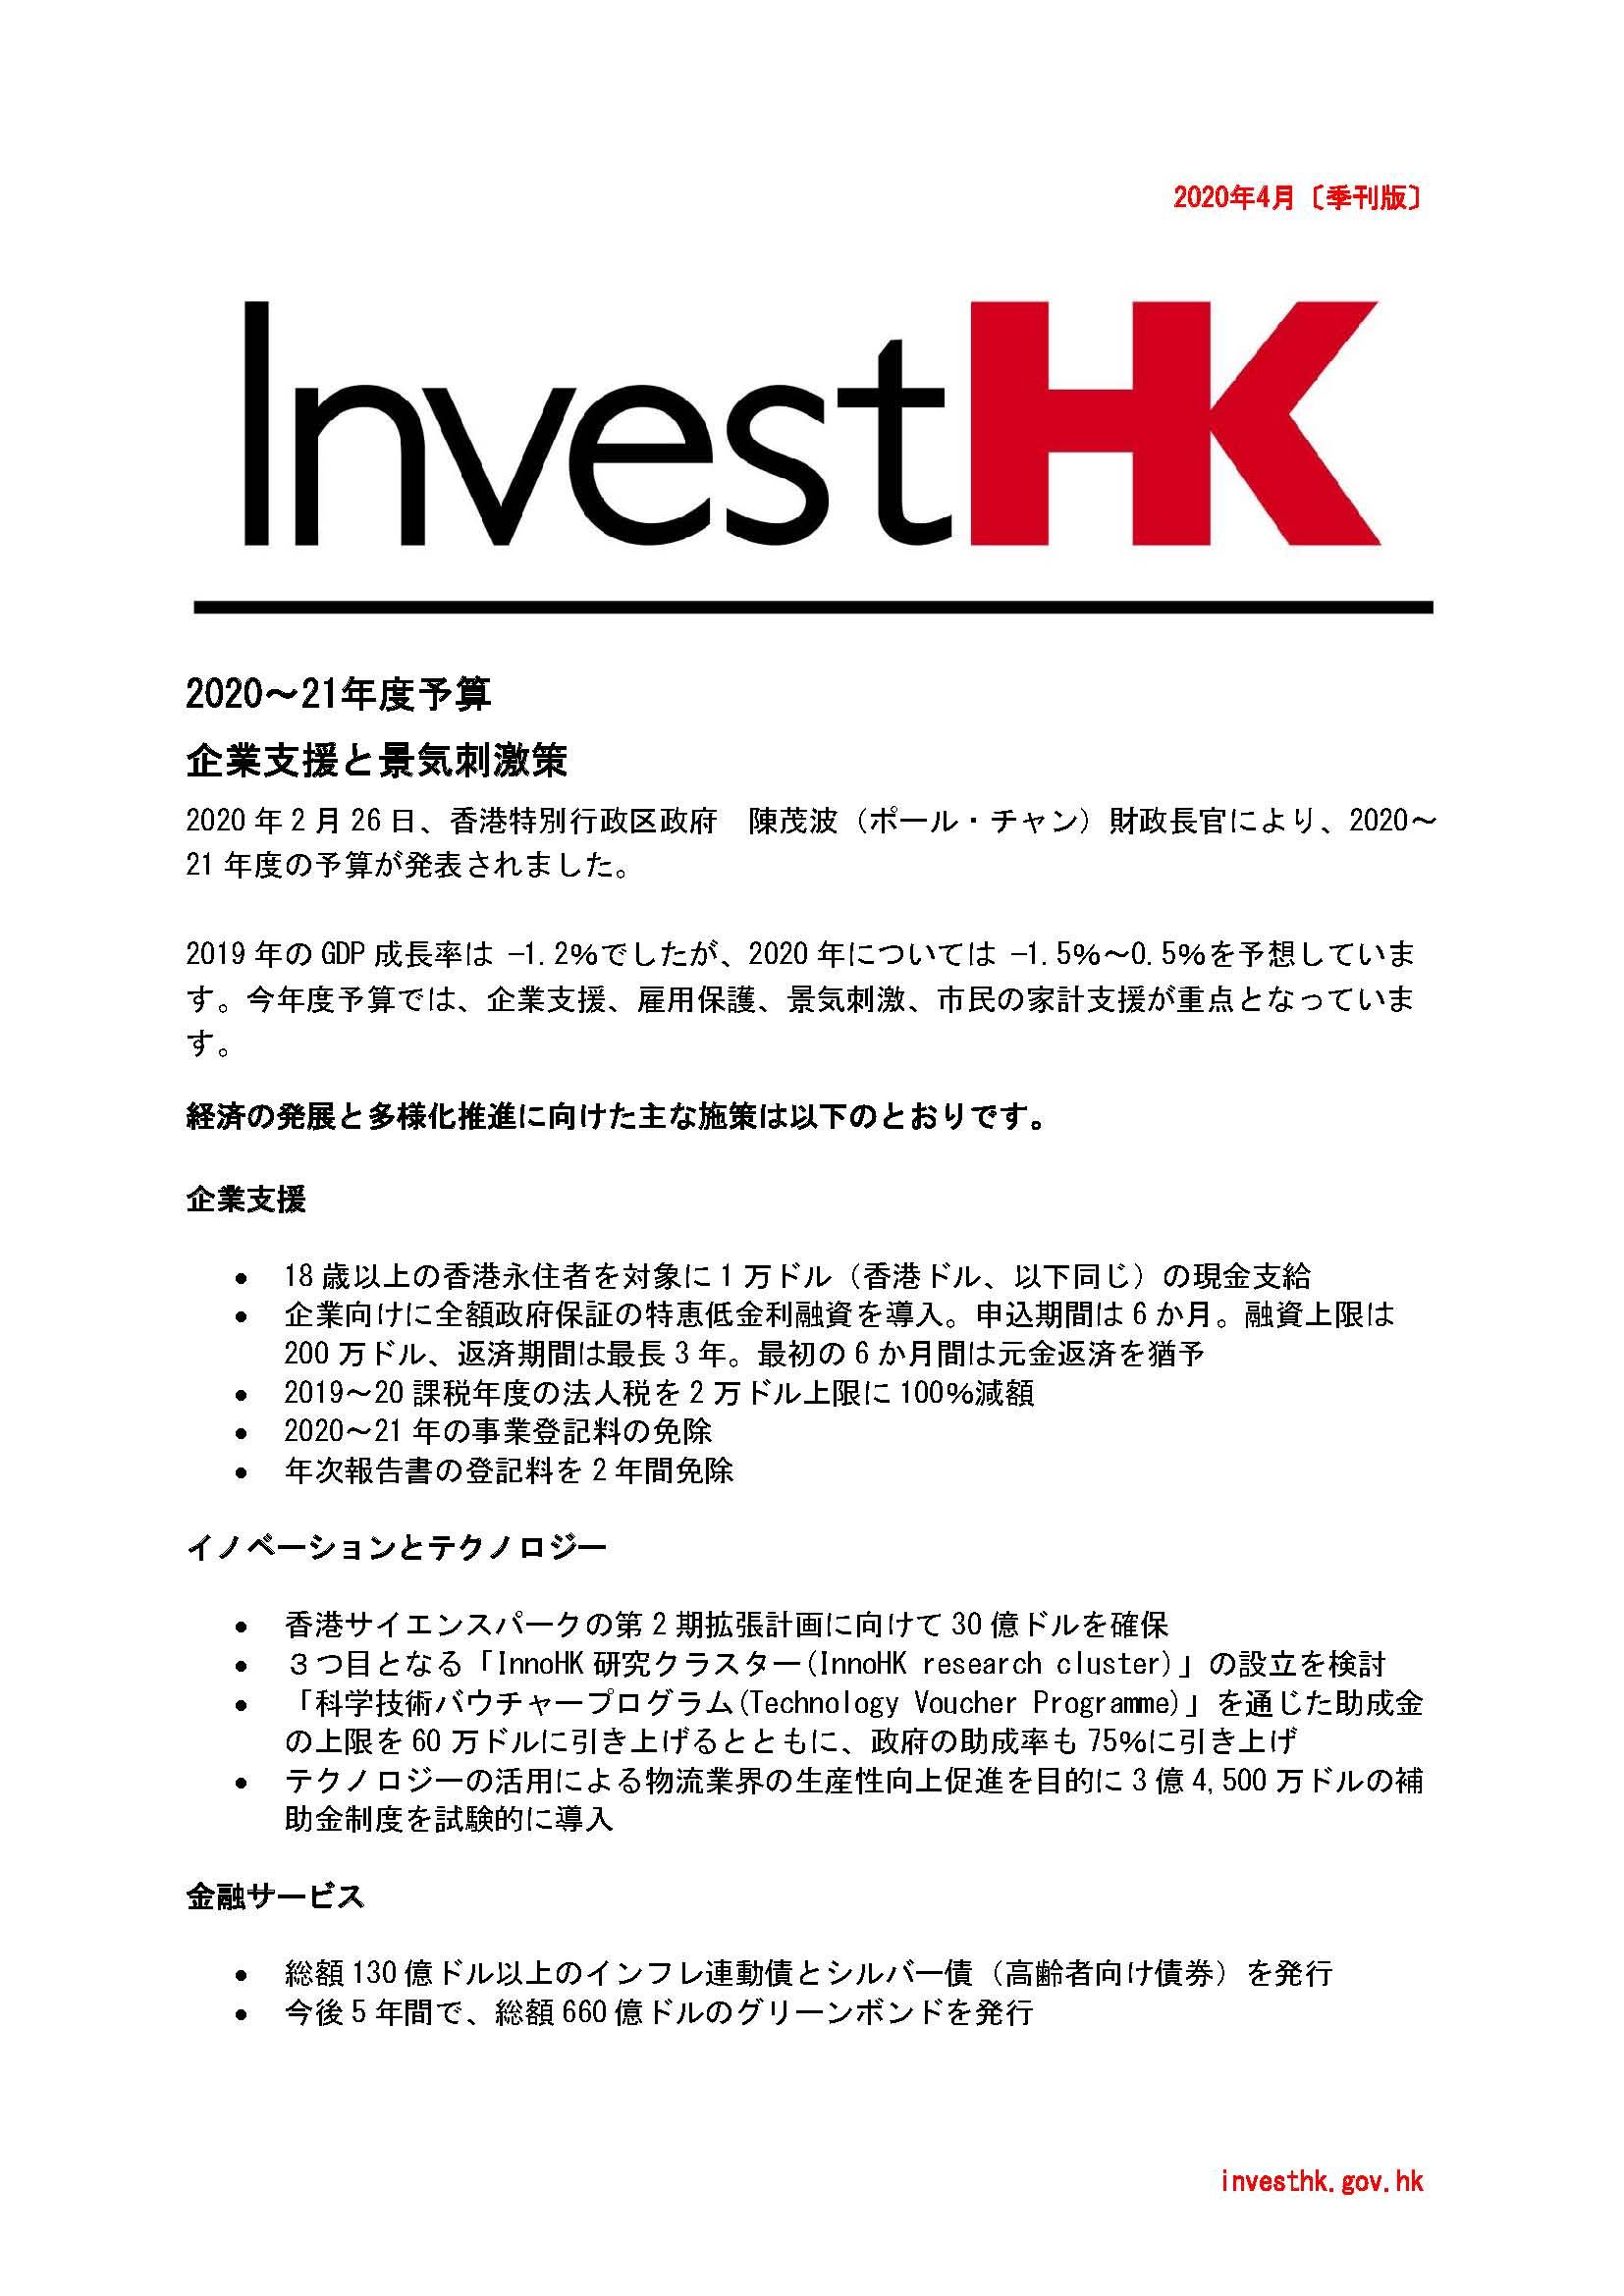 IHK Newsletter Apr2020 Jp Cover